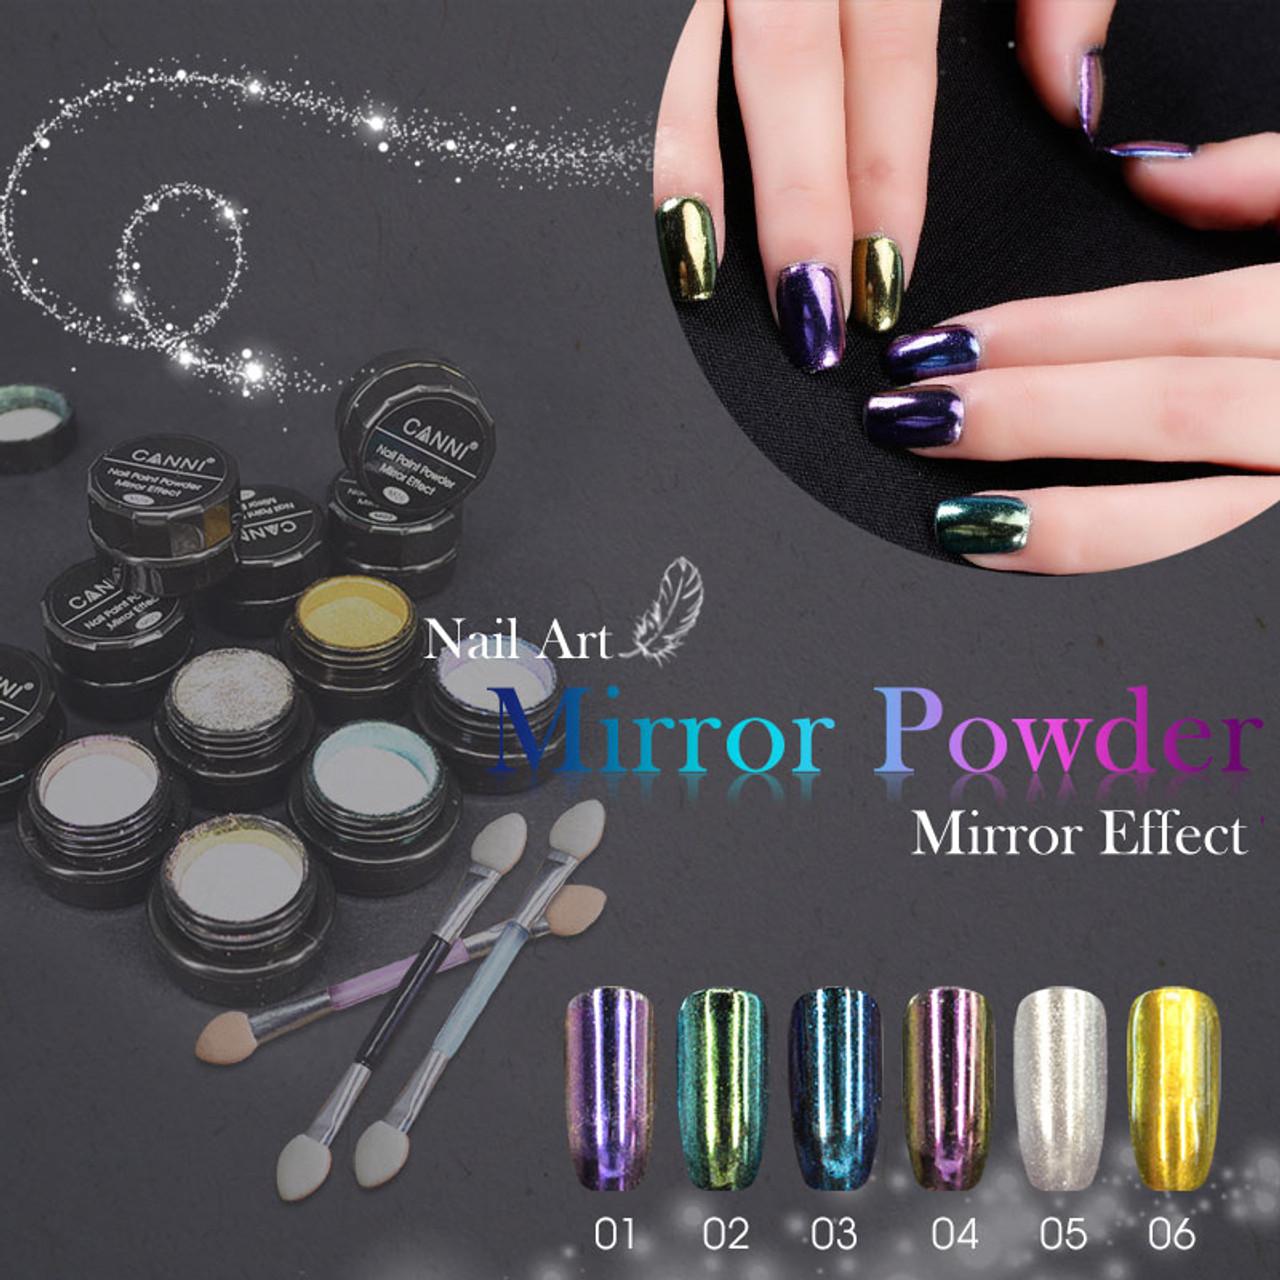 Metallic Mirror Effect Powder 2g - Fashion Mouse